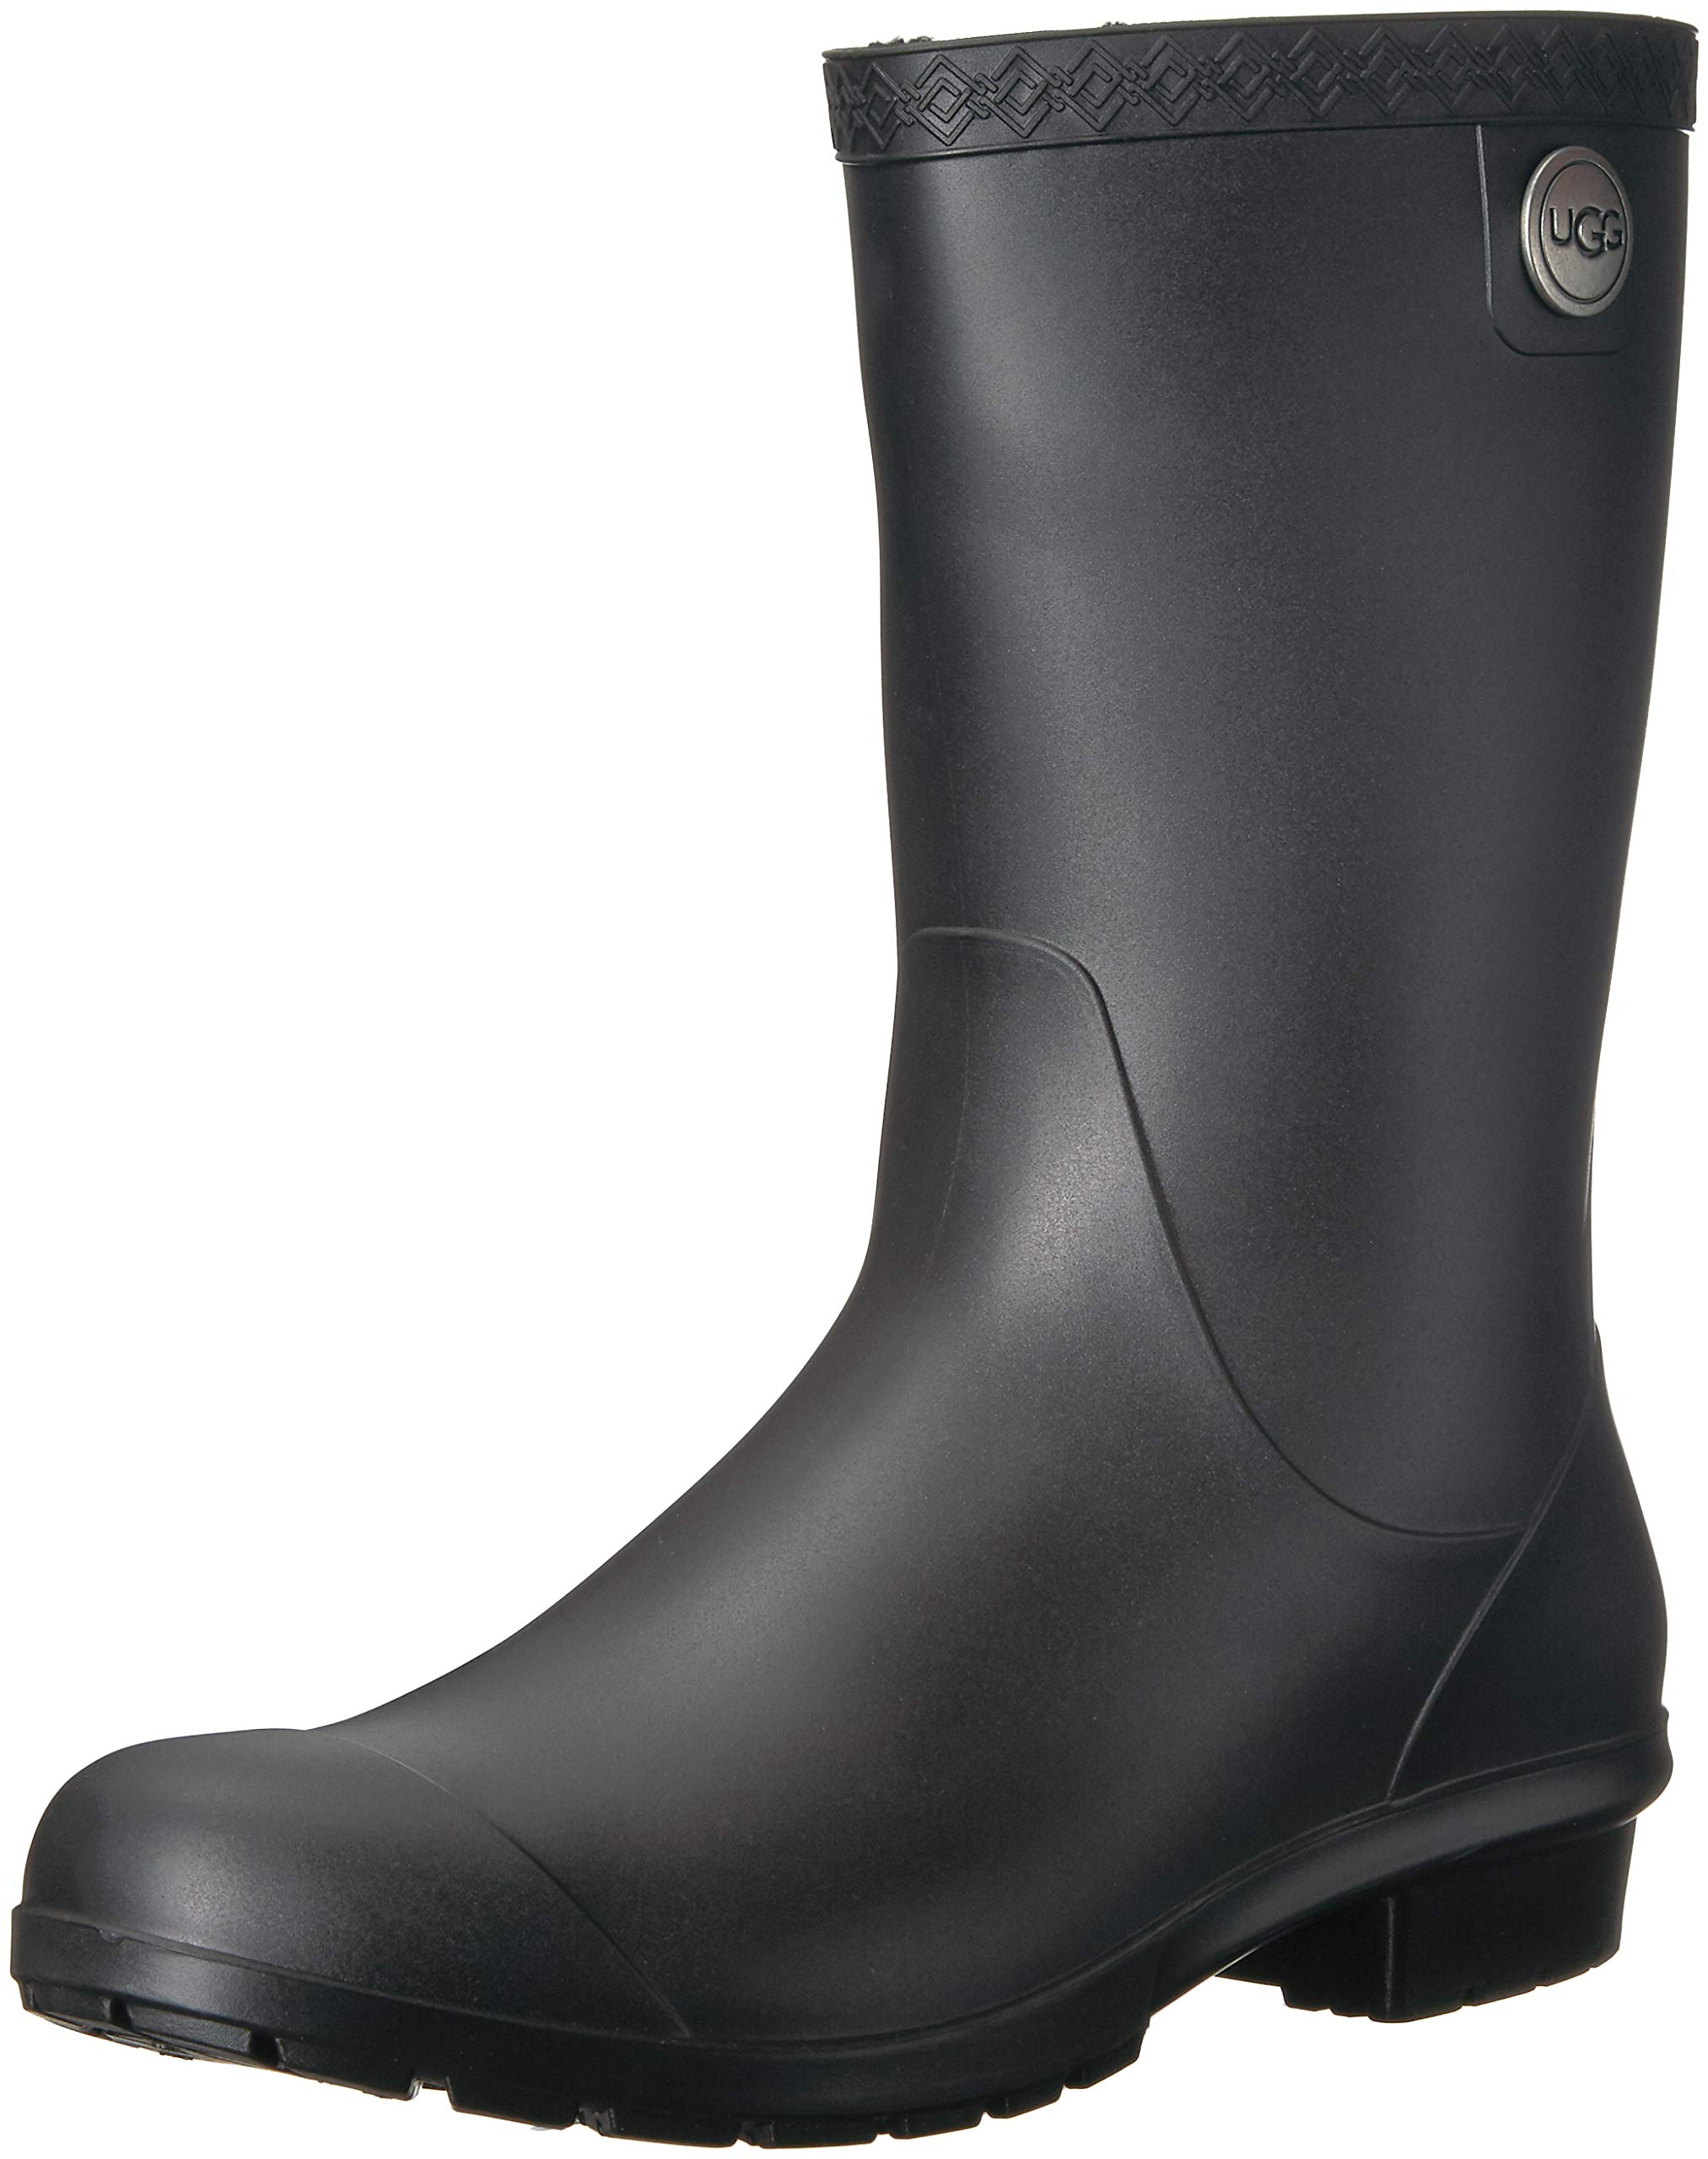 UGG Women's Sienna Matte Rain Boot, Black, 7 M US by UGG